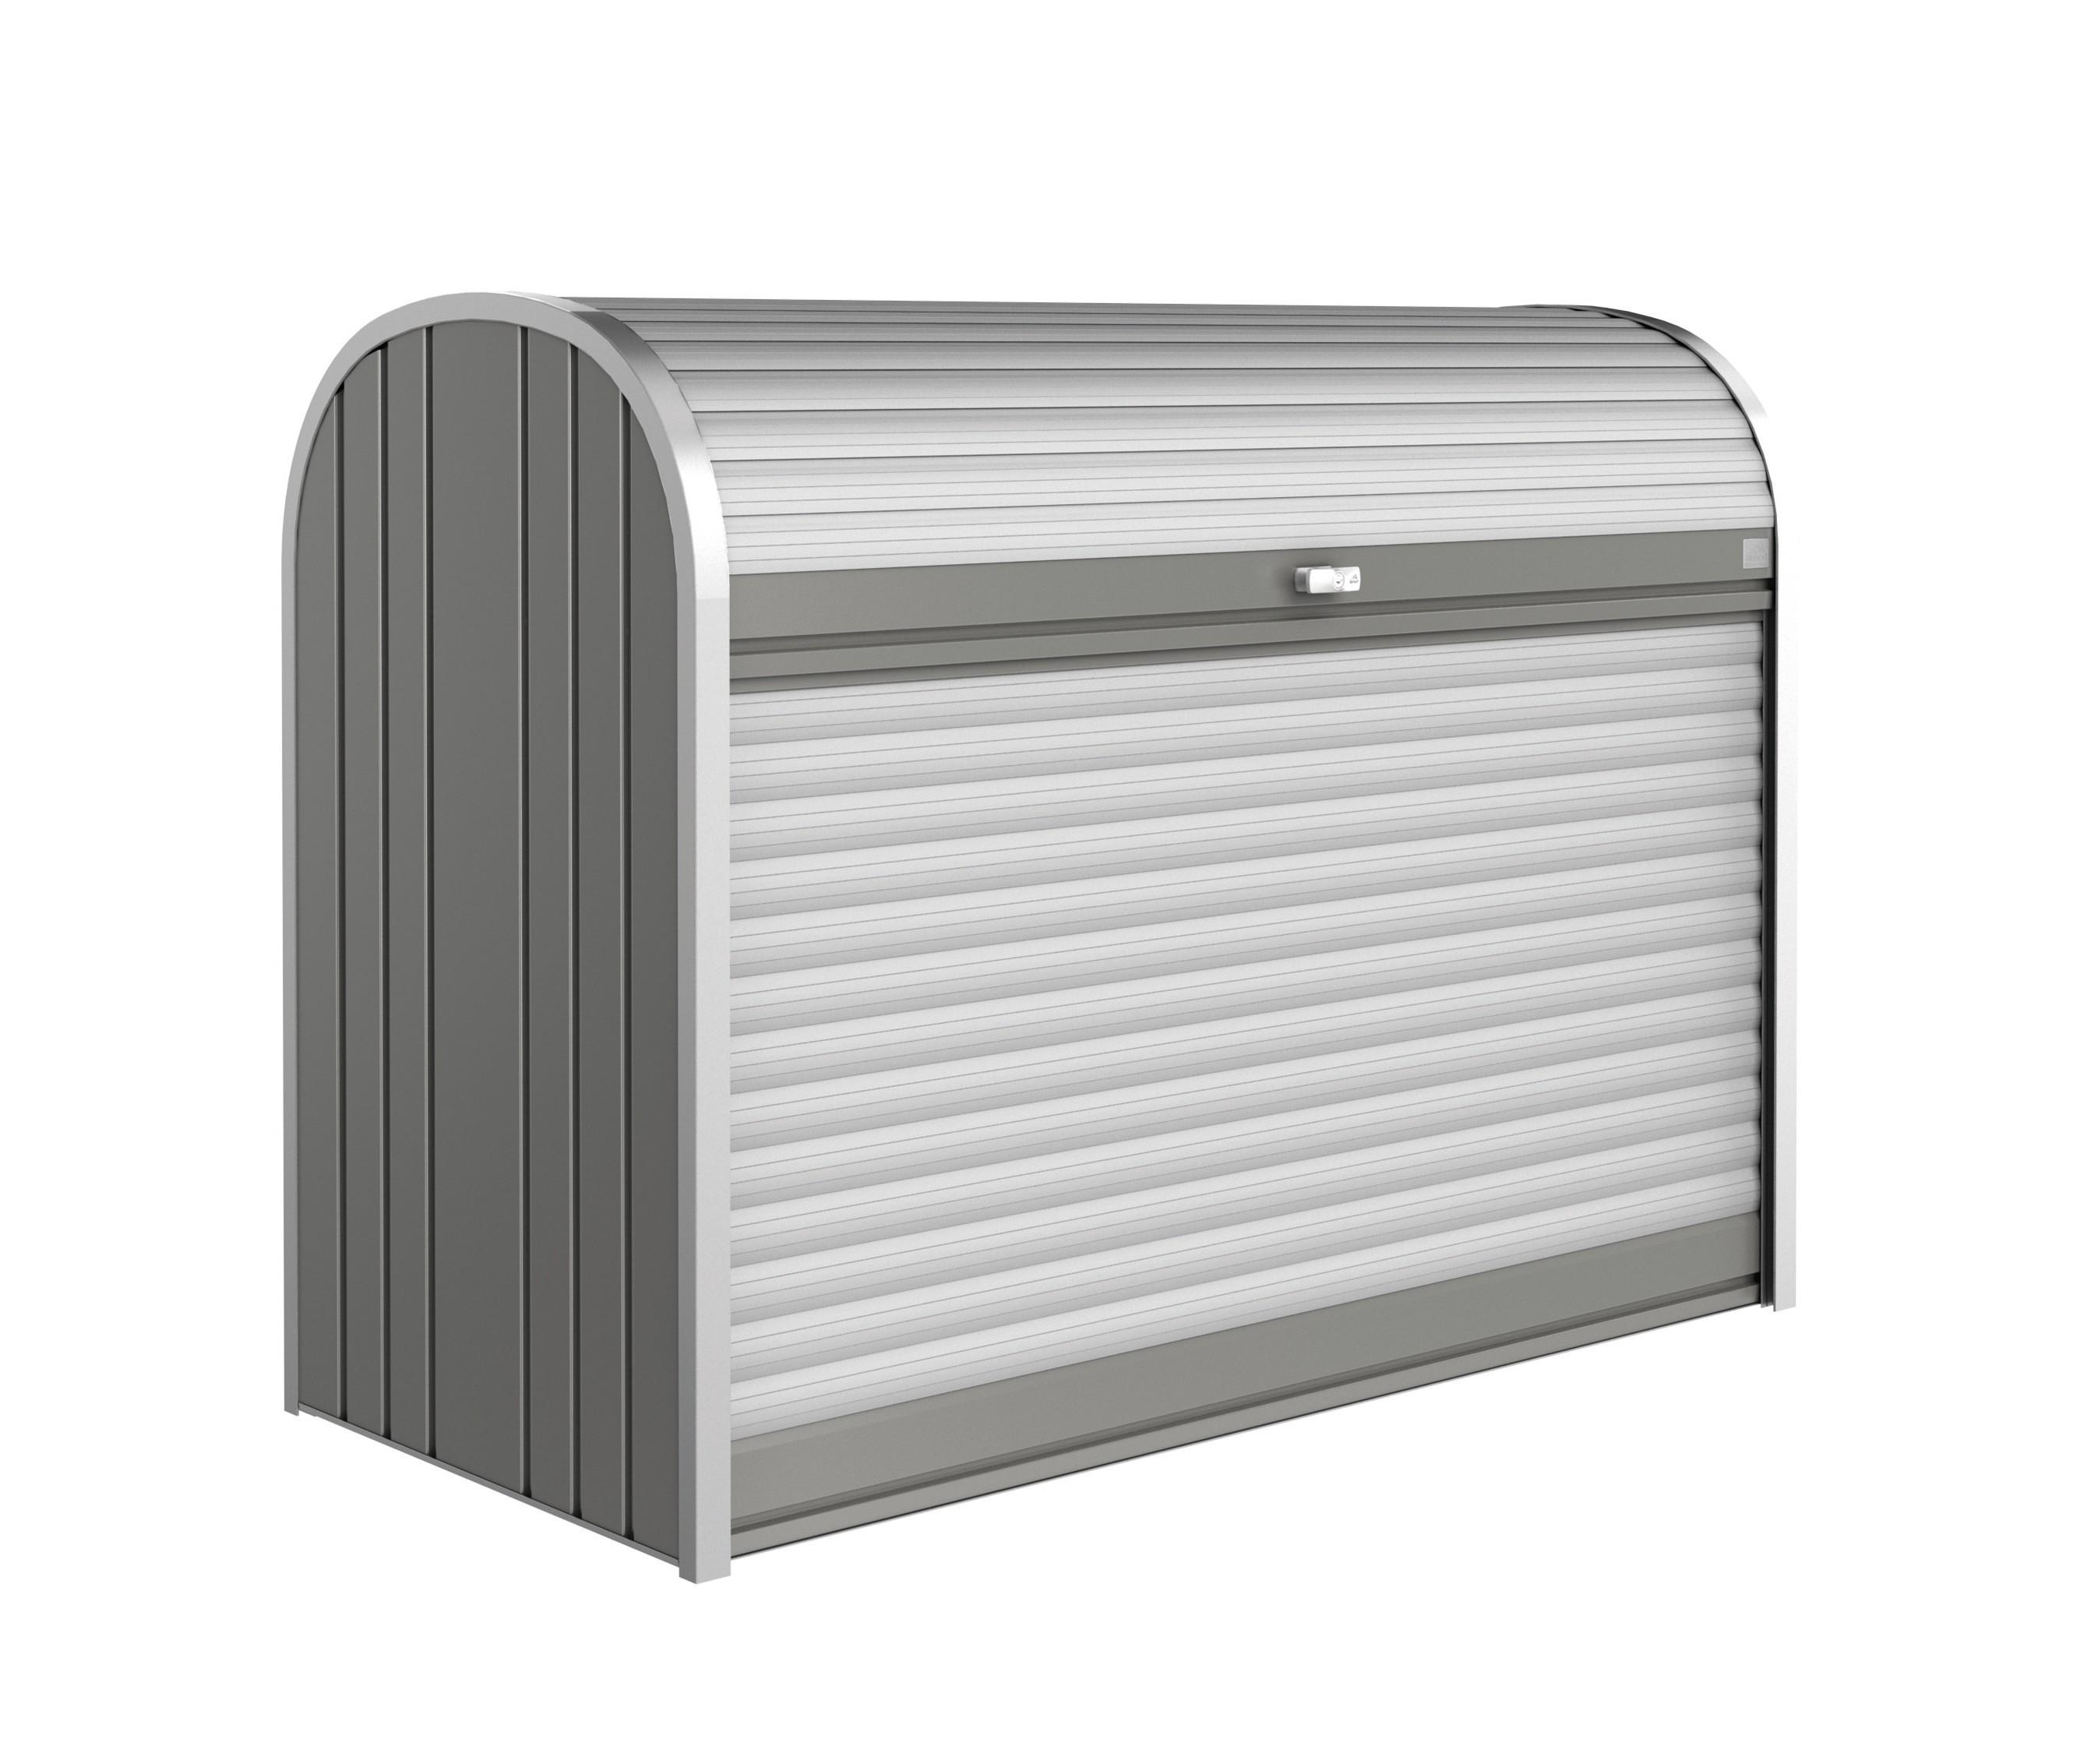 Gartenbox / Auflagenbox Biohort Storemax 160 quarzgrau Bild 1